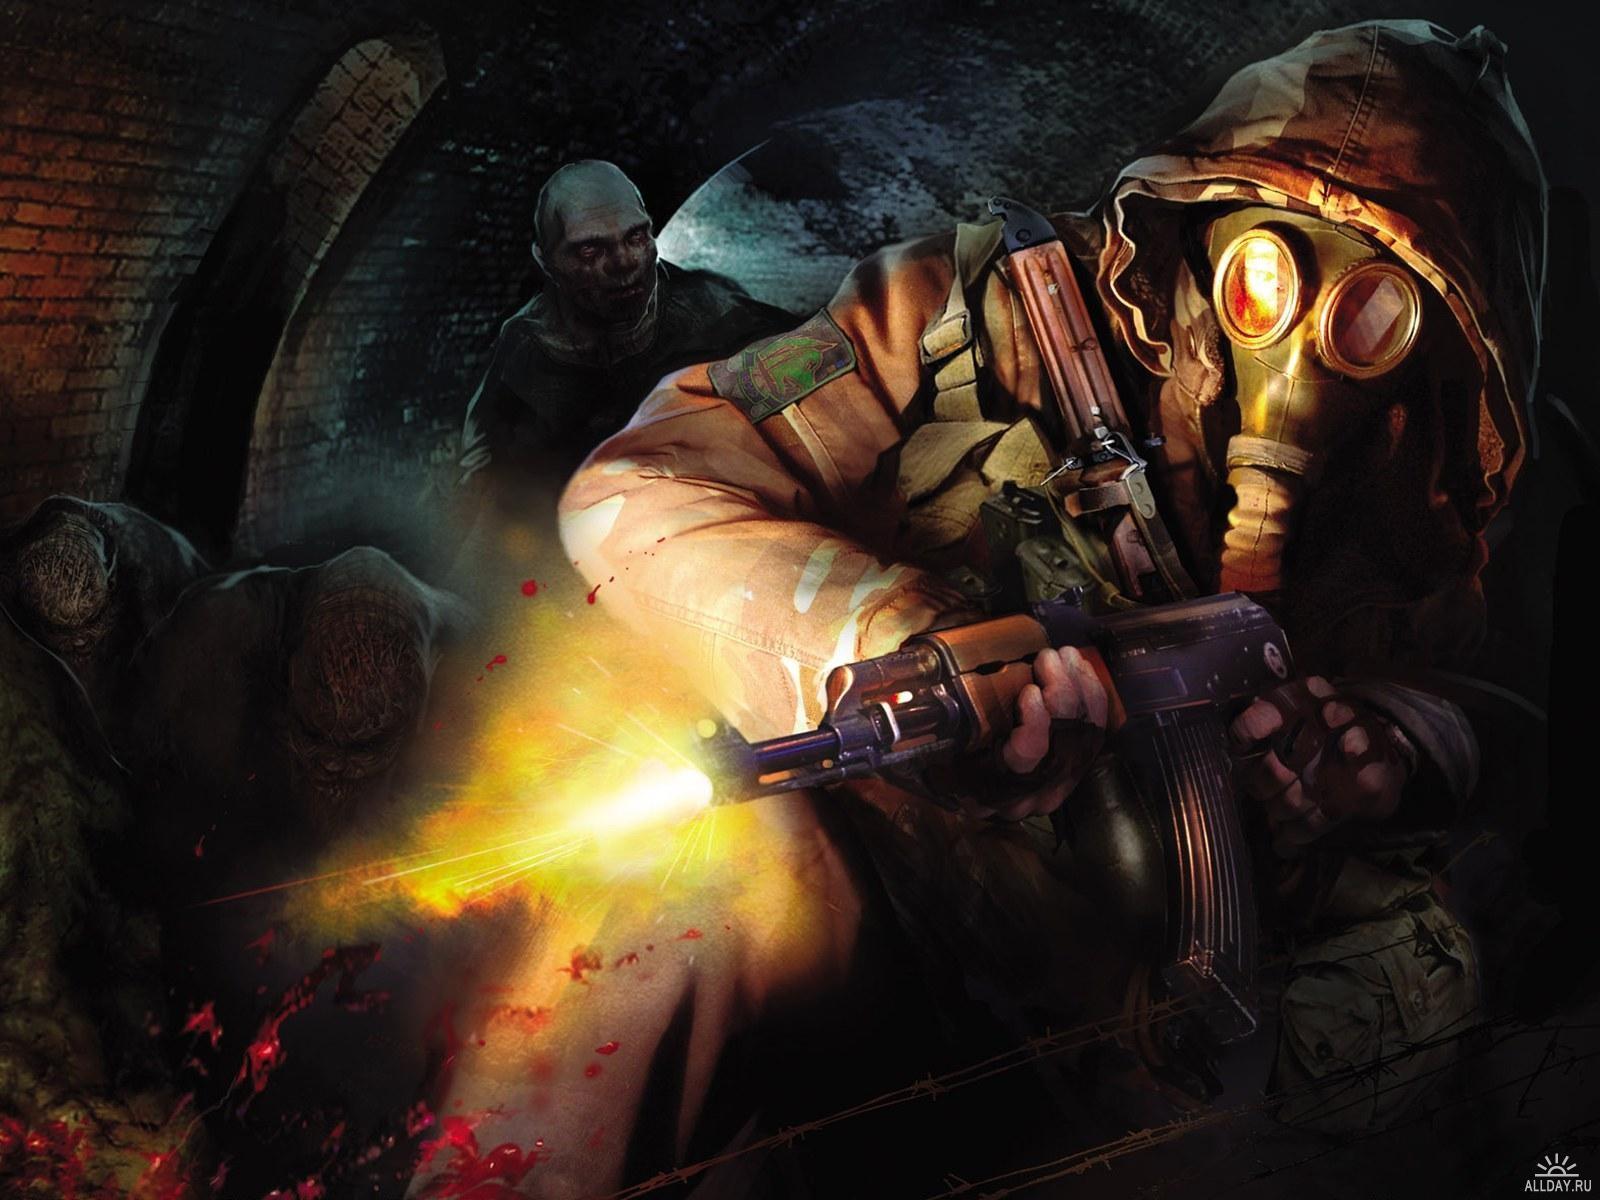 wallpaper video games s t a l k e r darkness screenshot rh wallhere com